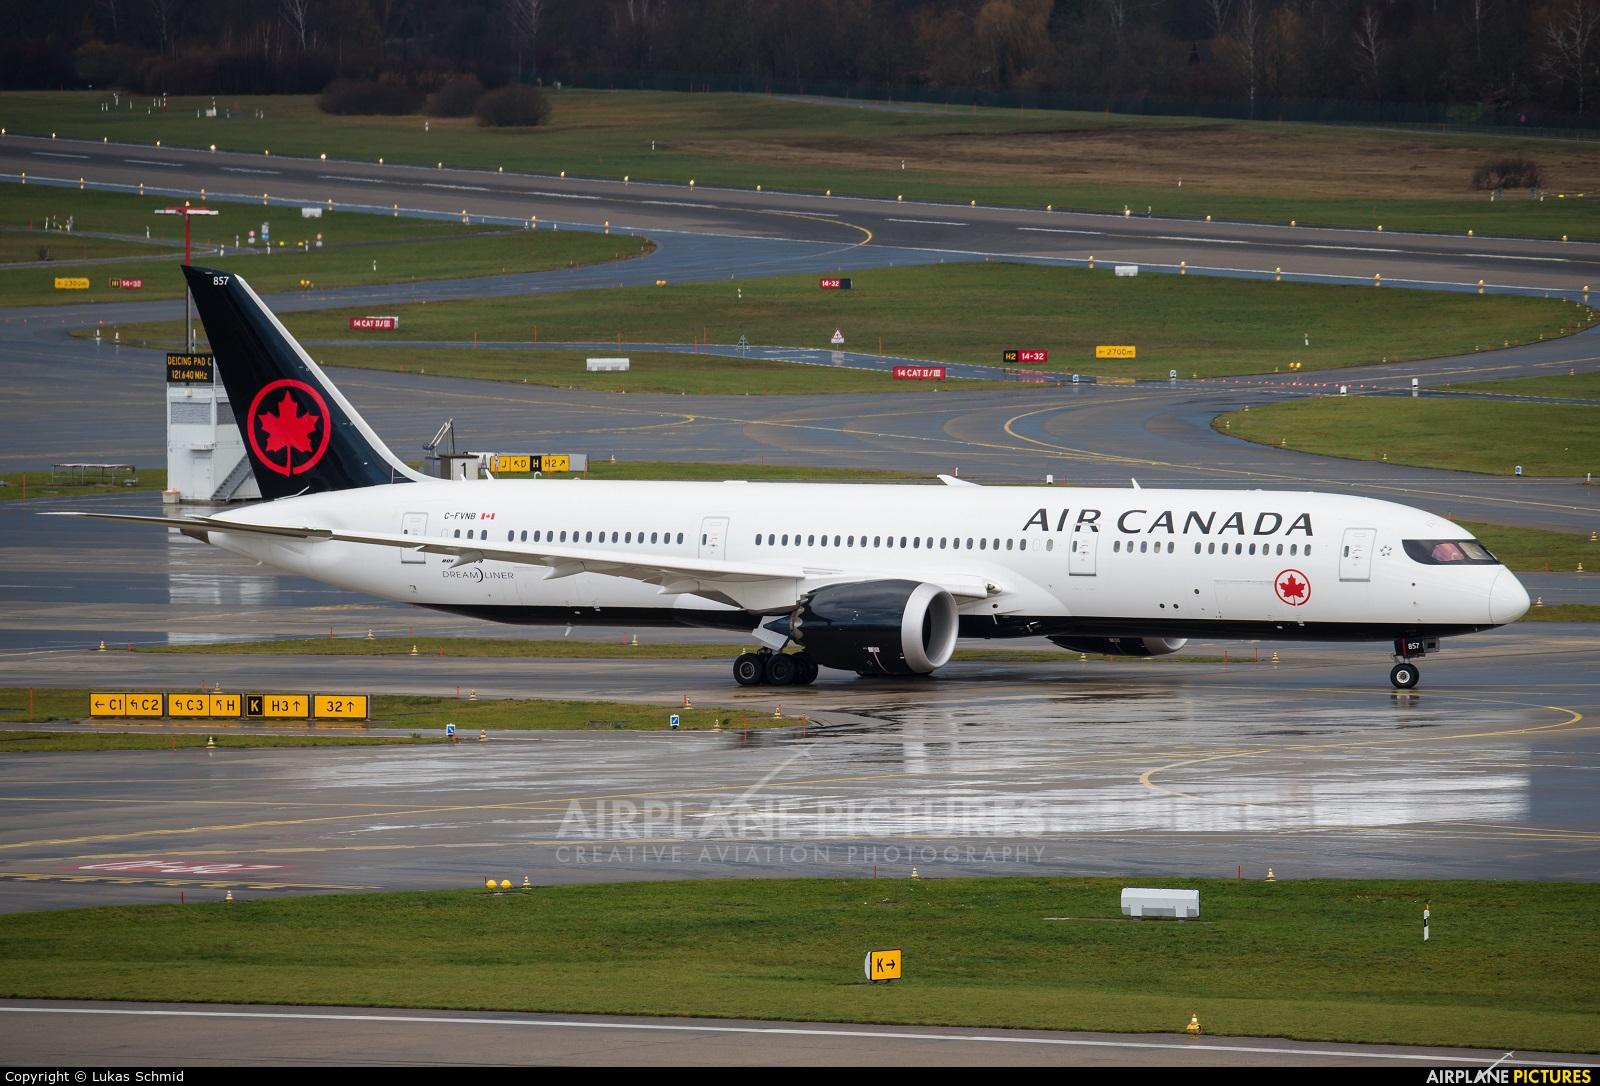 Air Canada C-FVNB aircraft at Zurich